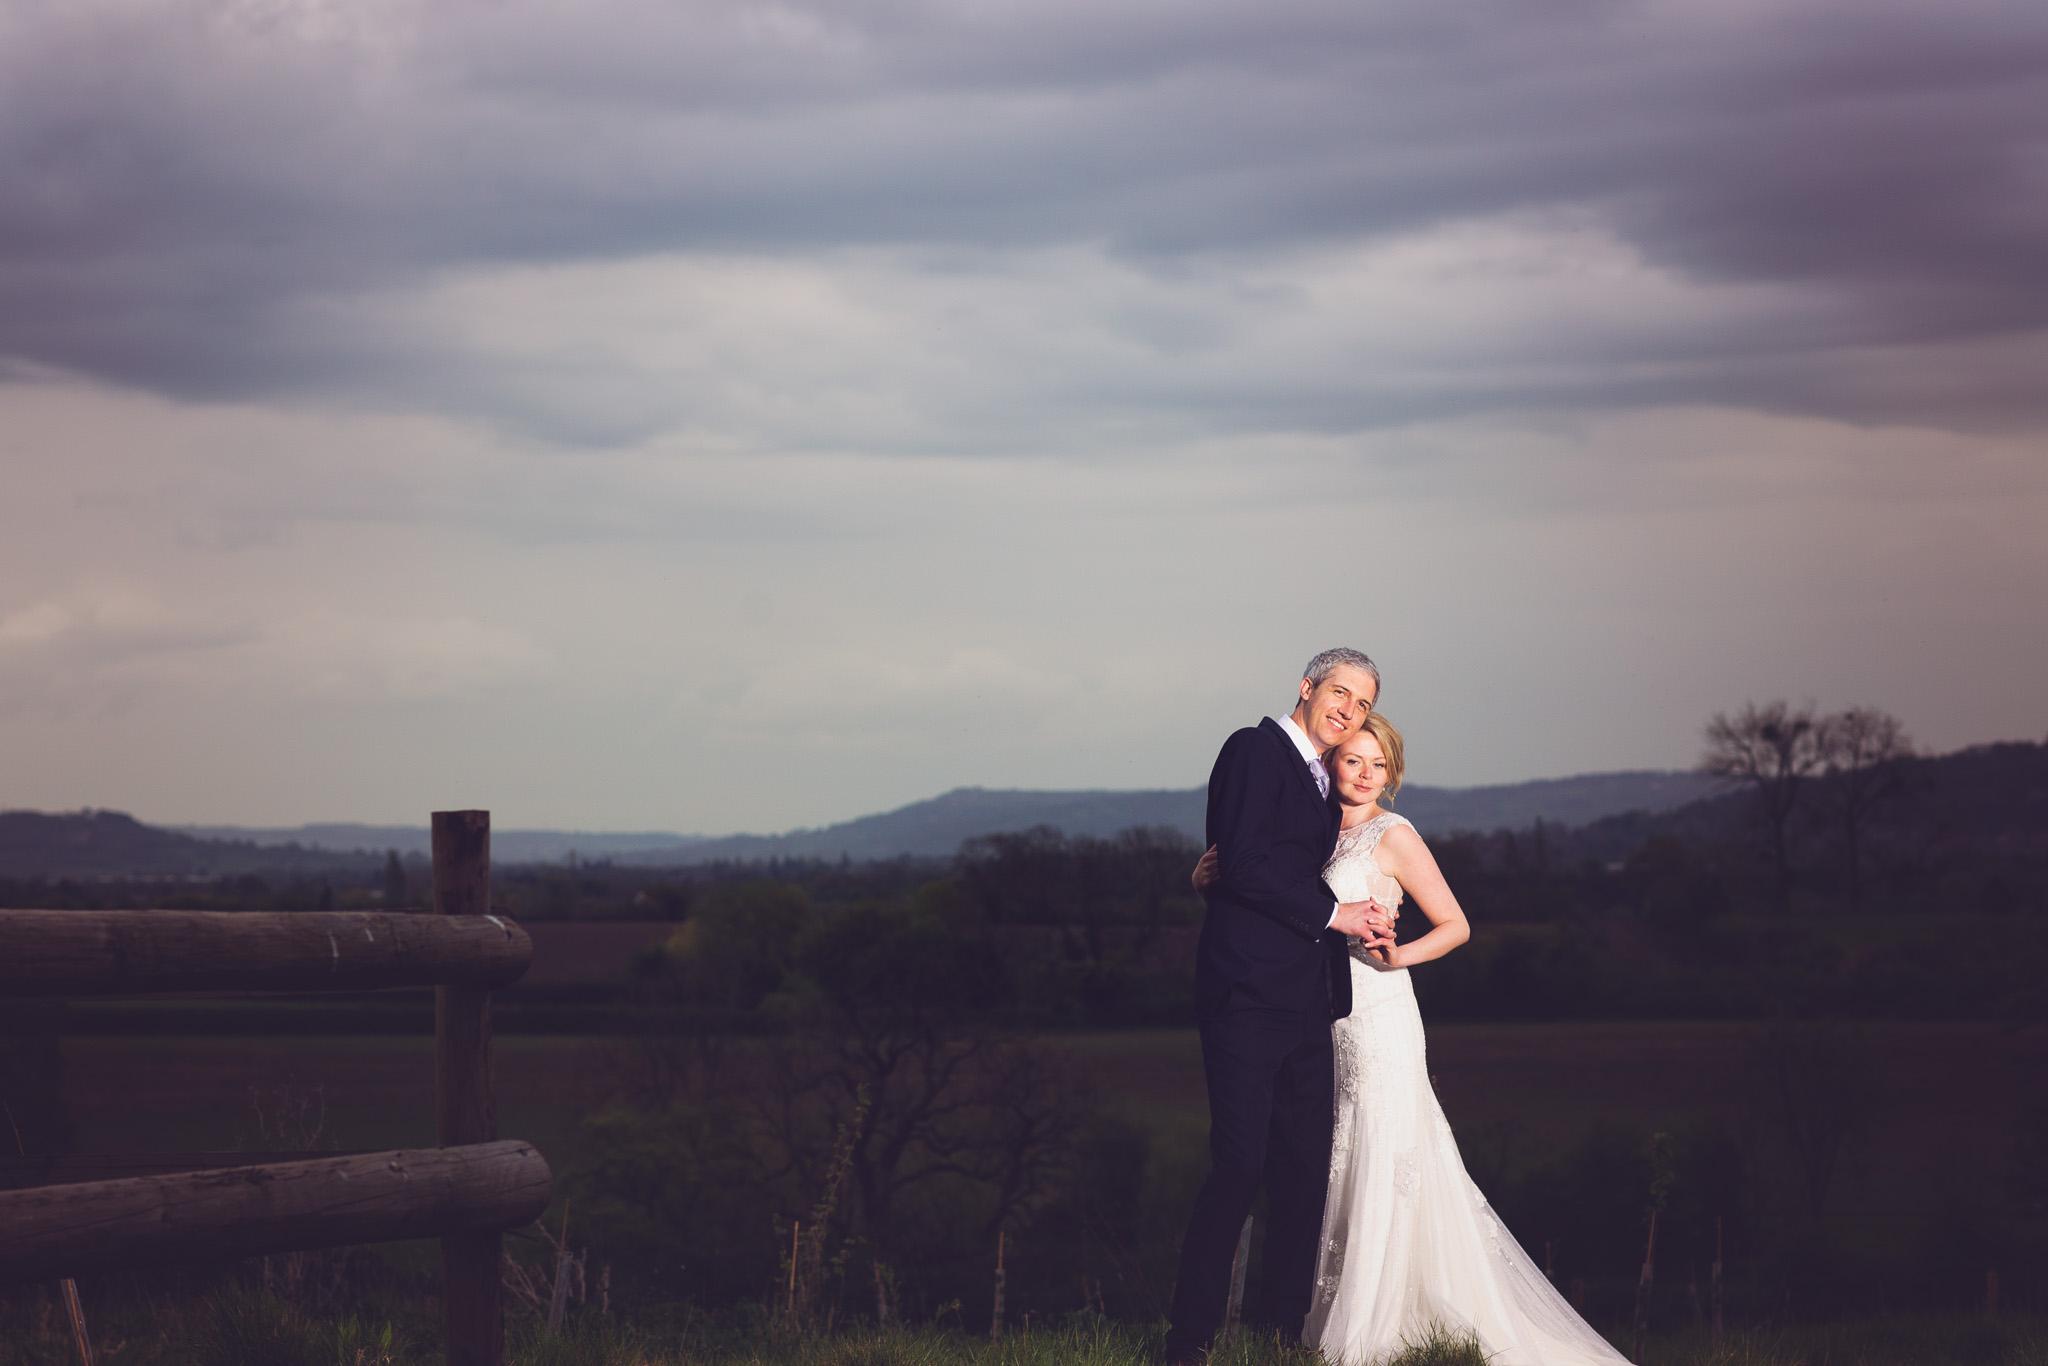 Mark_Barnes_Gloucester_Wedding_Photographer_Elmore_Court_Wedding_Photography_Mike+Kelly-93.jpg